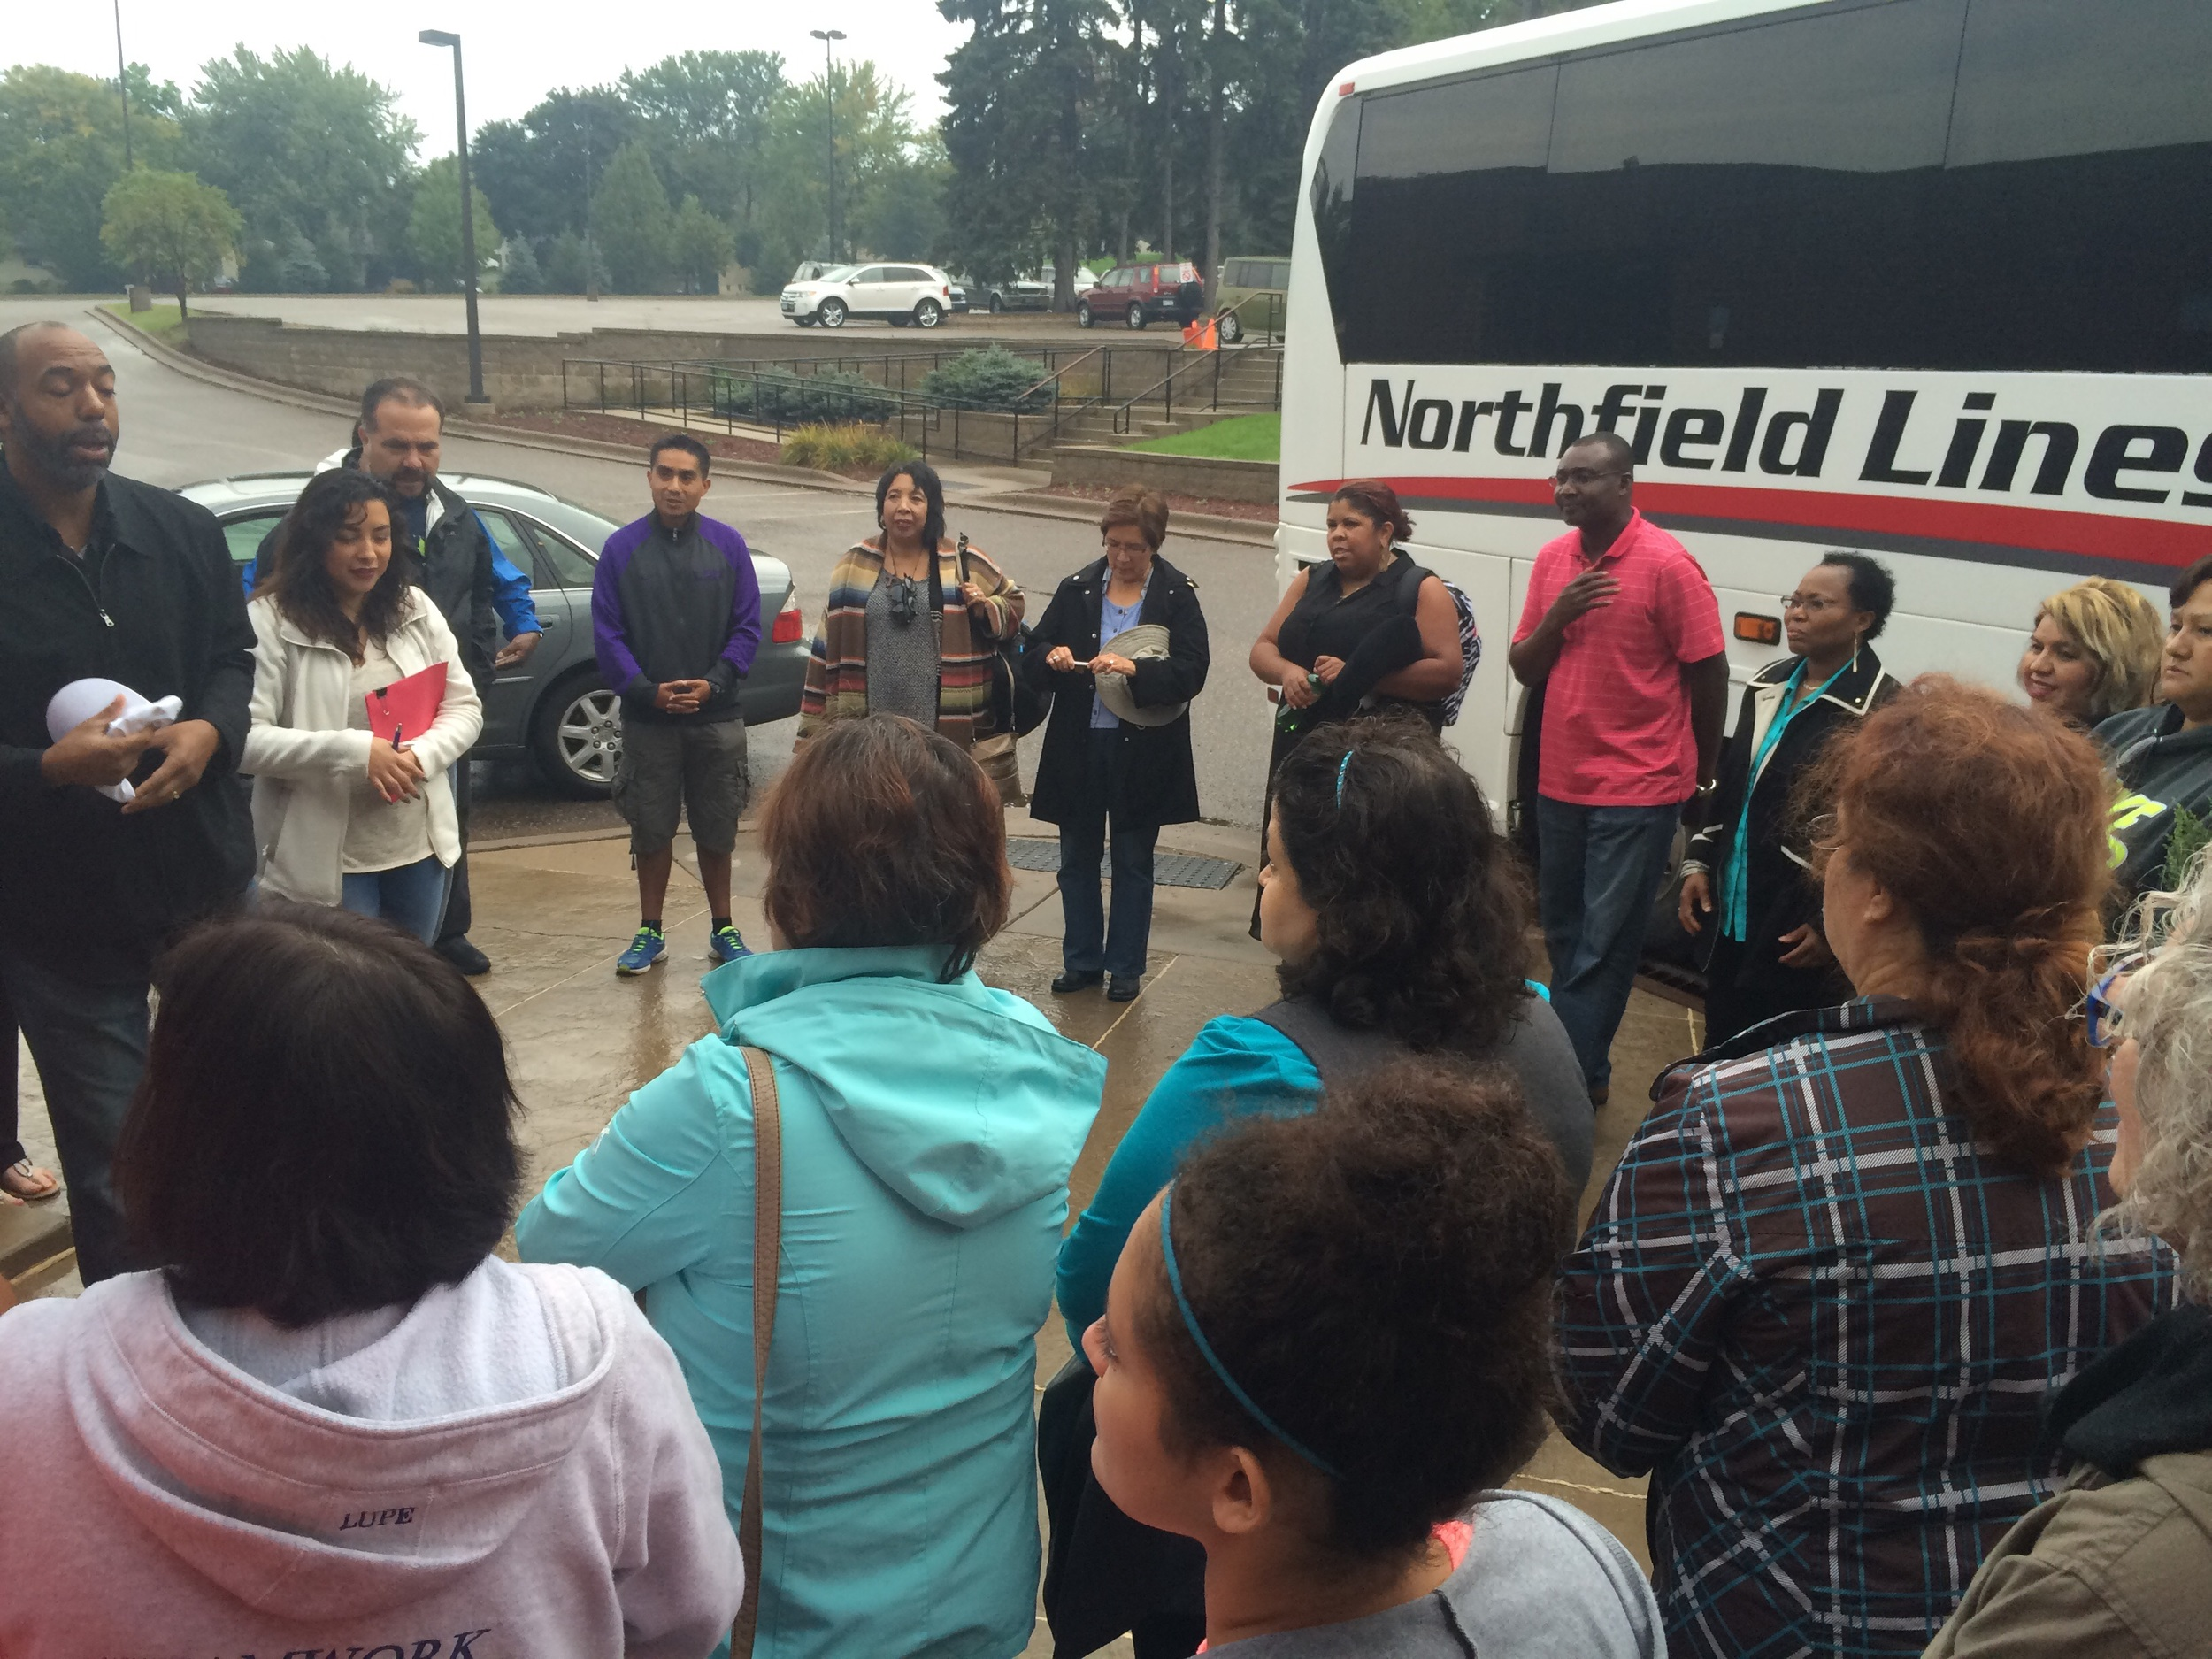 Isaiah Group Pilgrims prior to departure to Philadelphia.